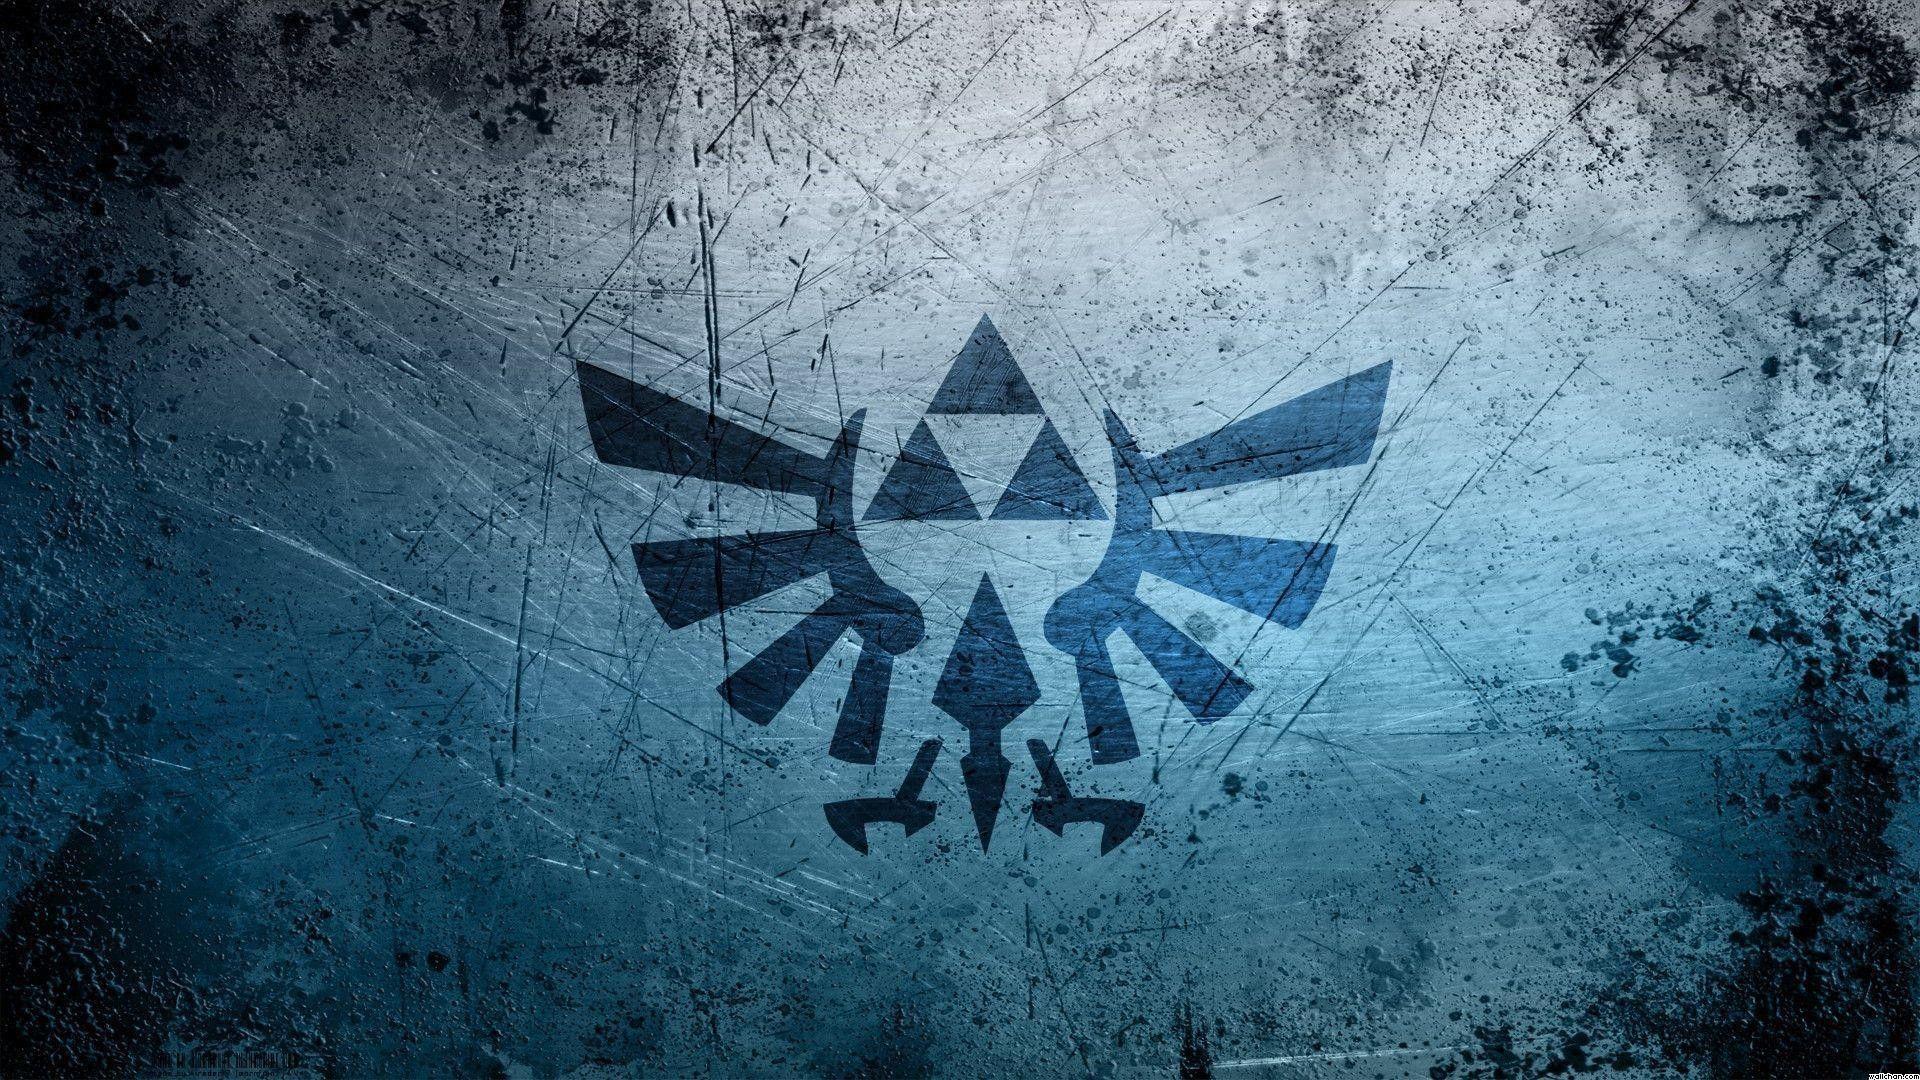 68 Zelda Triforce Wallpapers On Wallpaperplay In 2020 Gaming Wallpapers Triforce Wallpaper